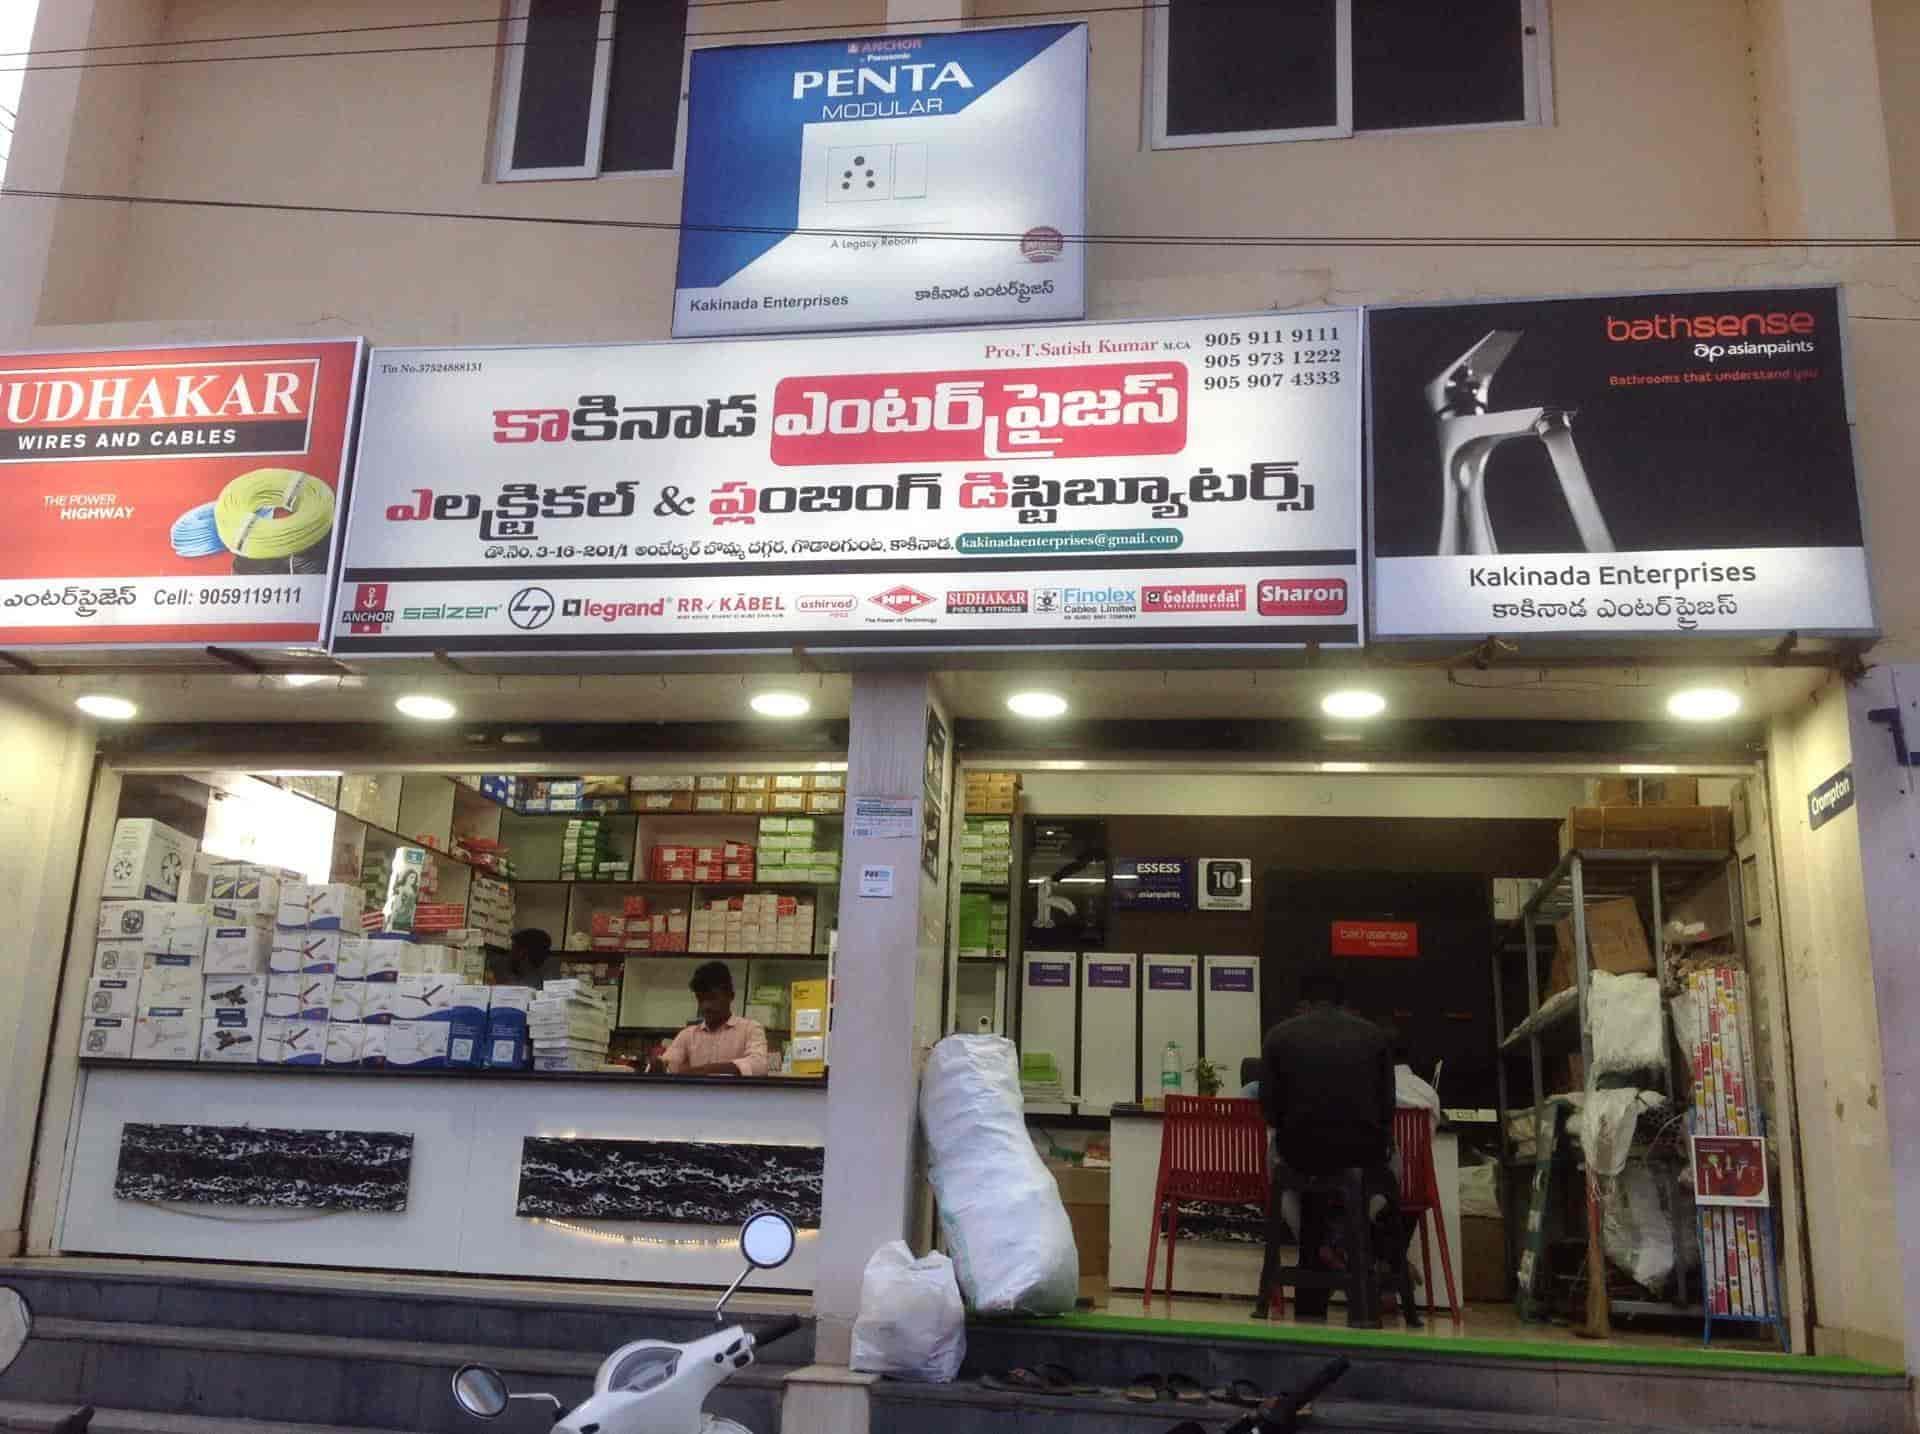 Kakinada Enterprises Godari Gunta Electrical Accessory Dealers In Kakinada Justdial